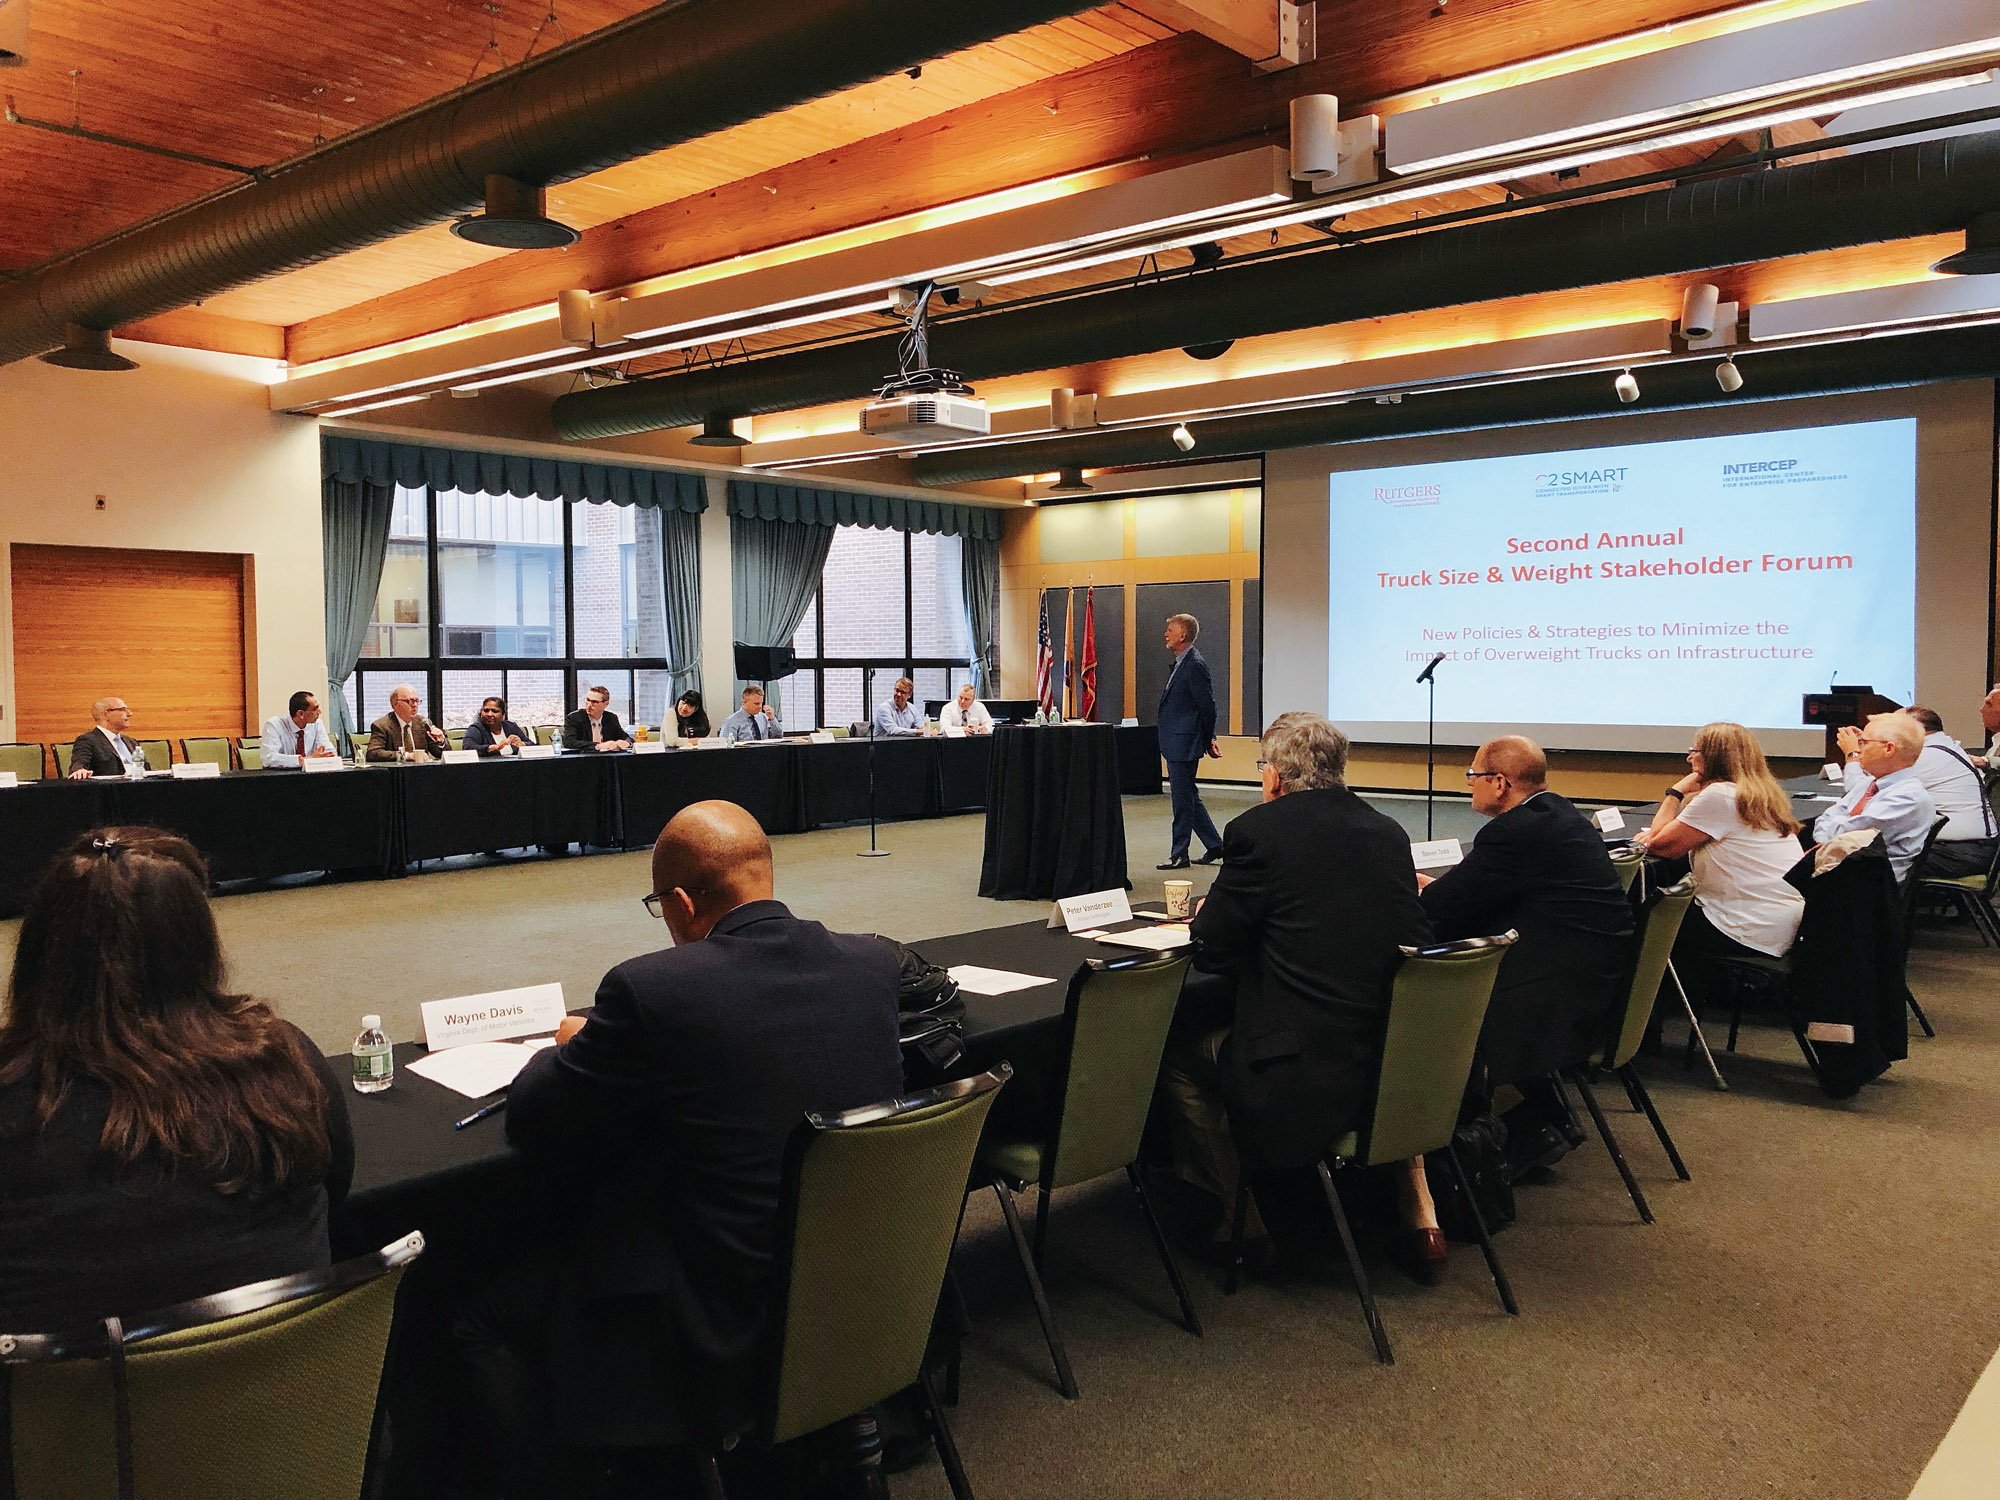 2nd Annual Truck Forum - full room